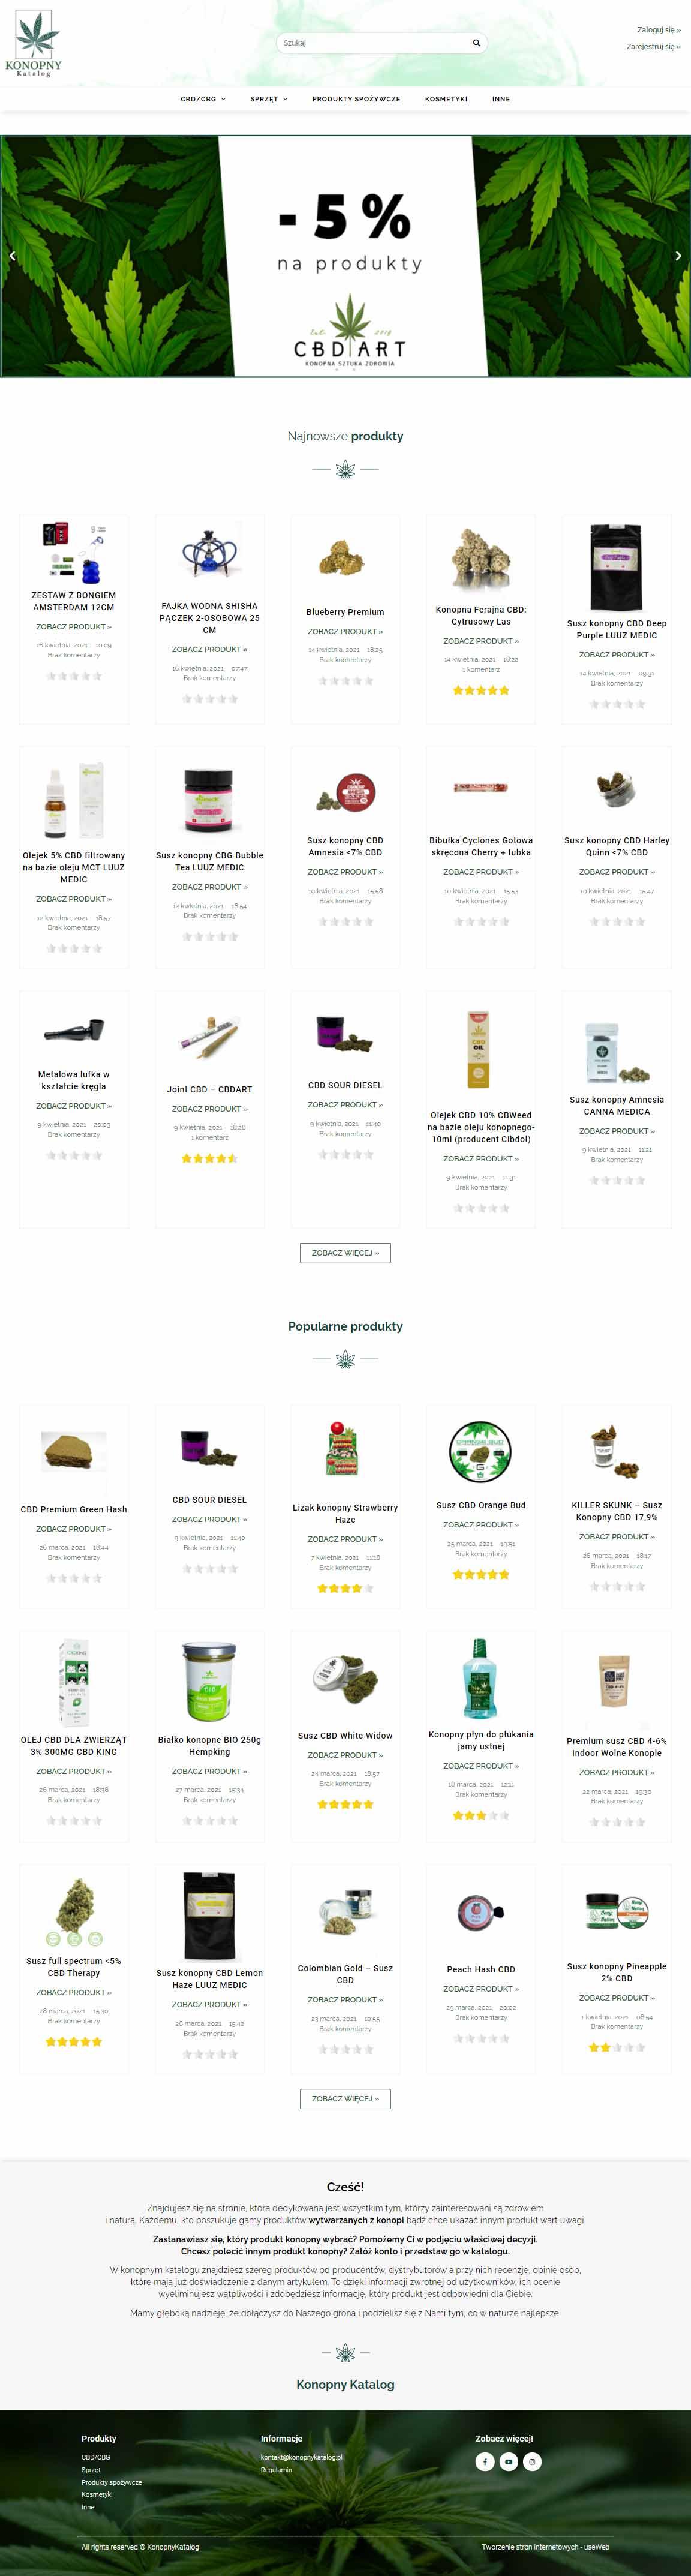 useweb-utworzona-strona-internetowa-portfolio-konopnykatalog